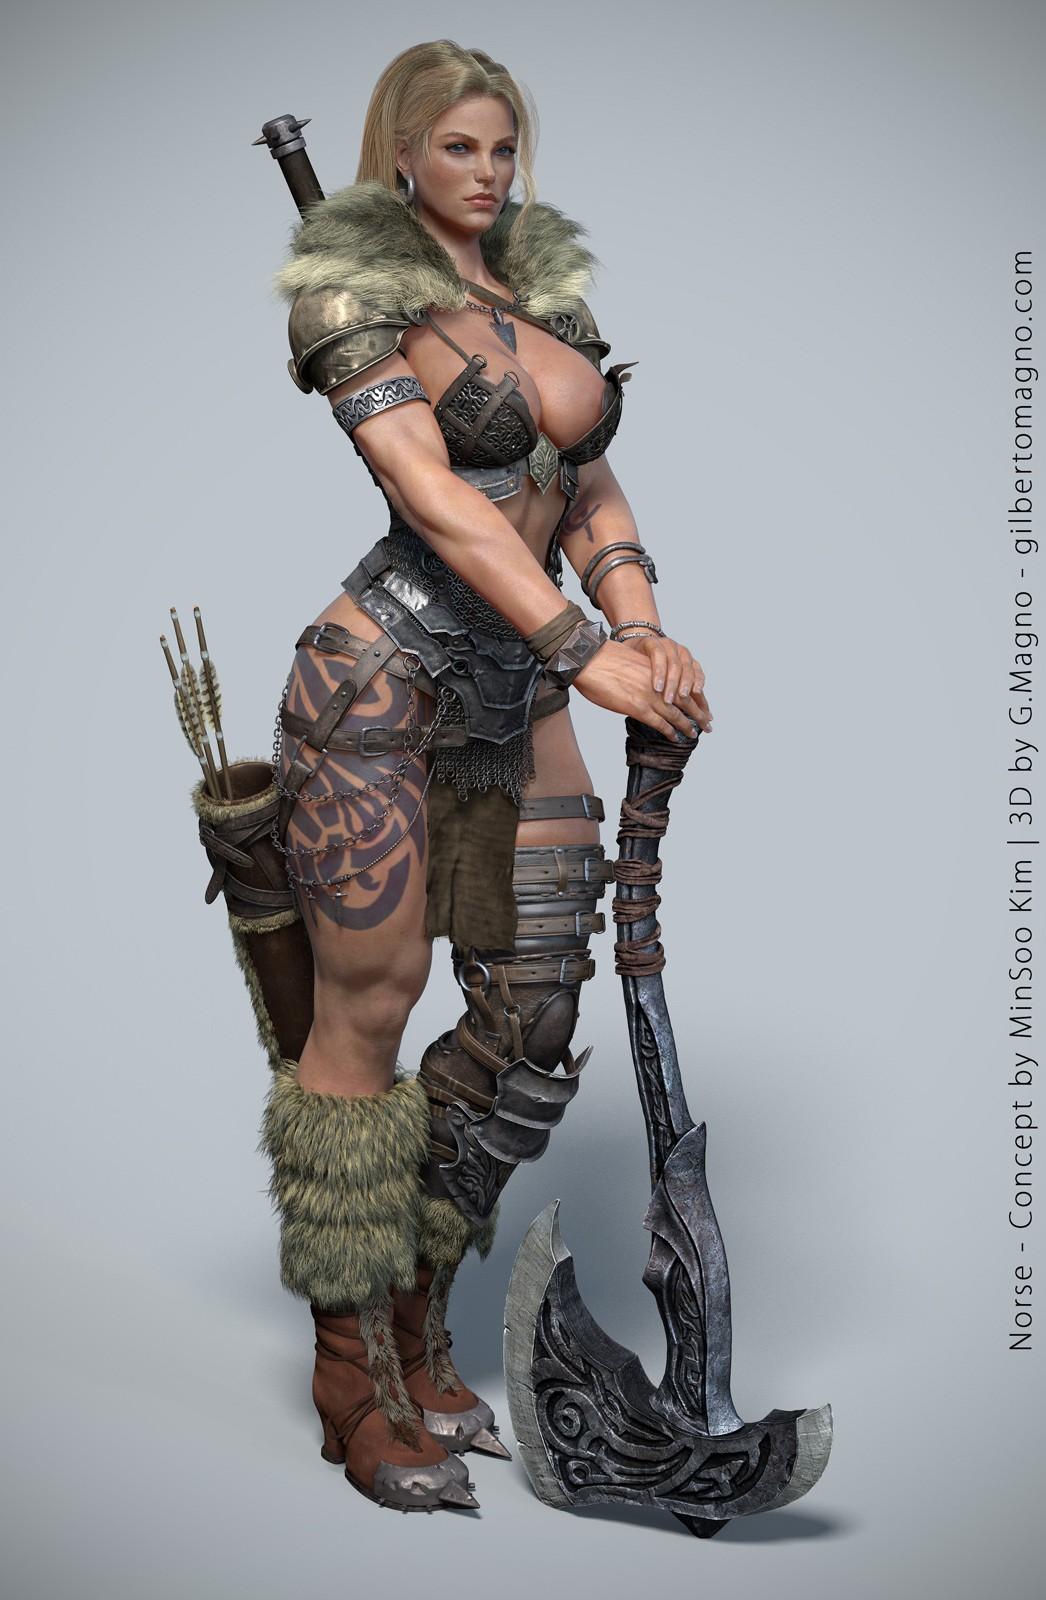 General 1046x1600 norse women render 3D big boobs warrior fantasy girl fantasy art digital art simple background axes weapon Barbarian cleavage